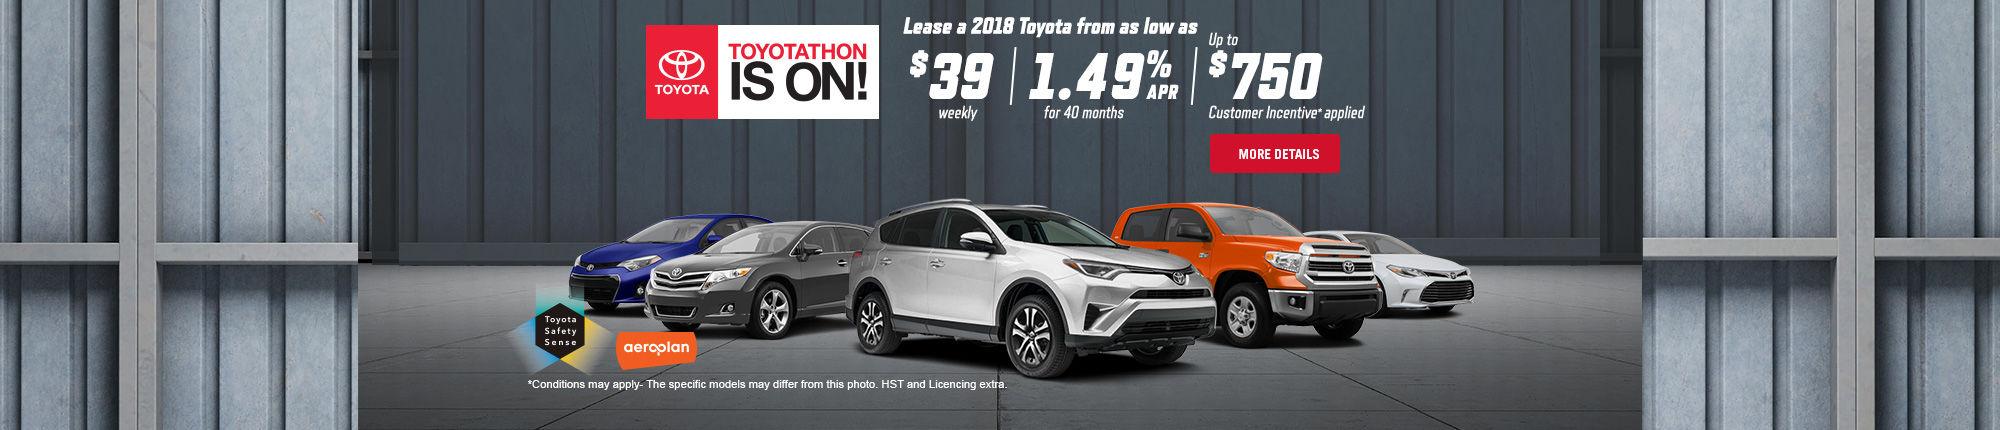 Toyotathon Event